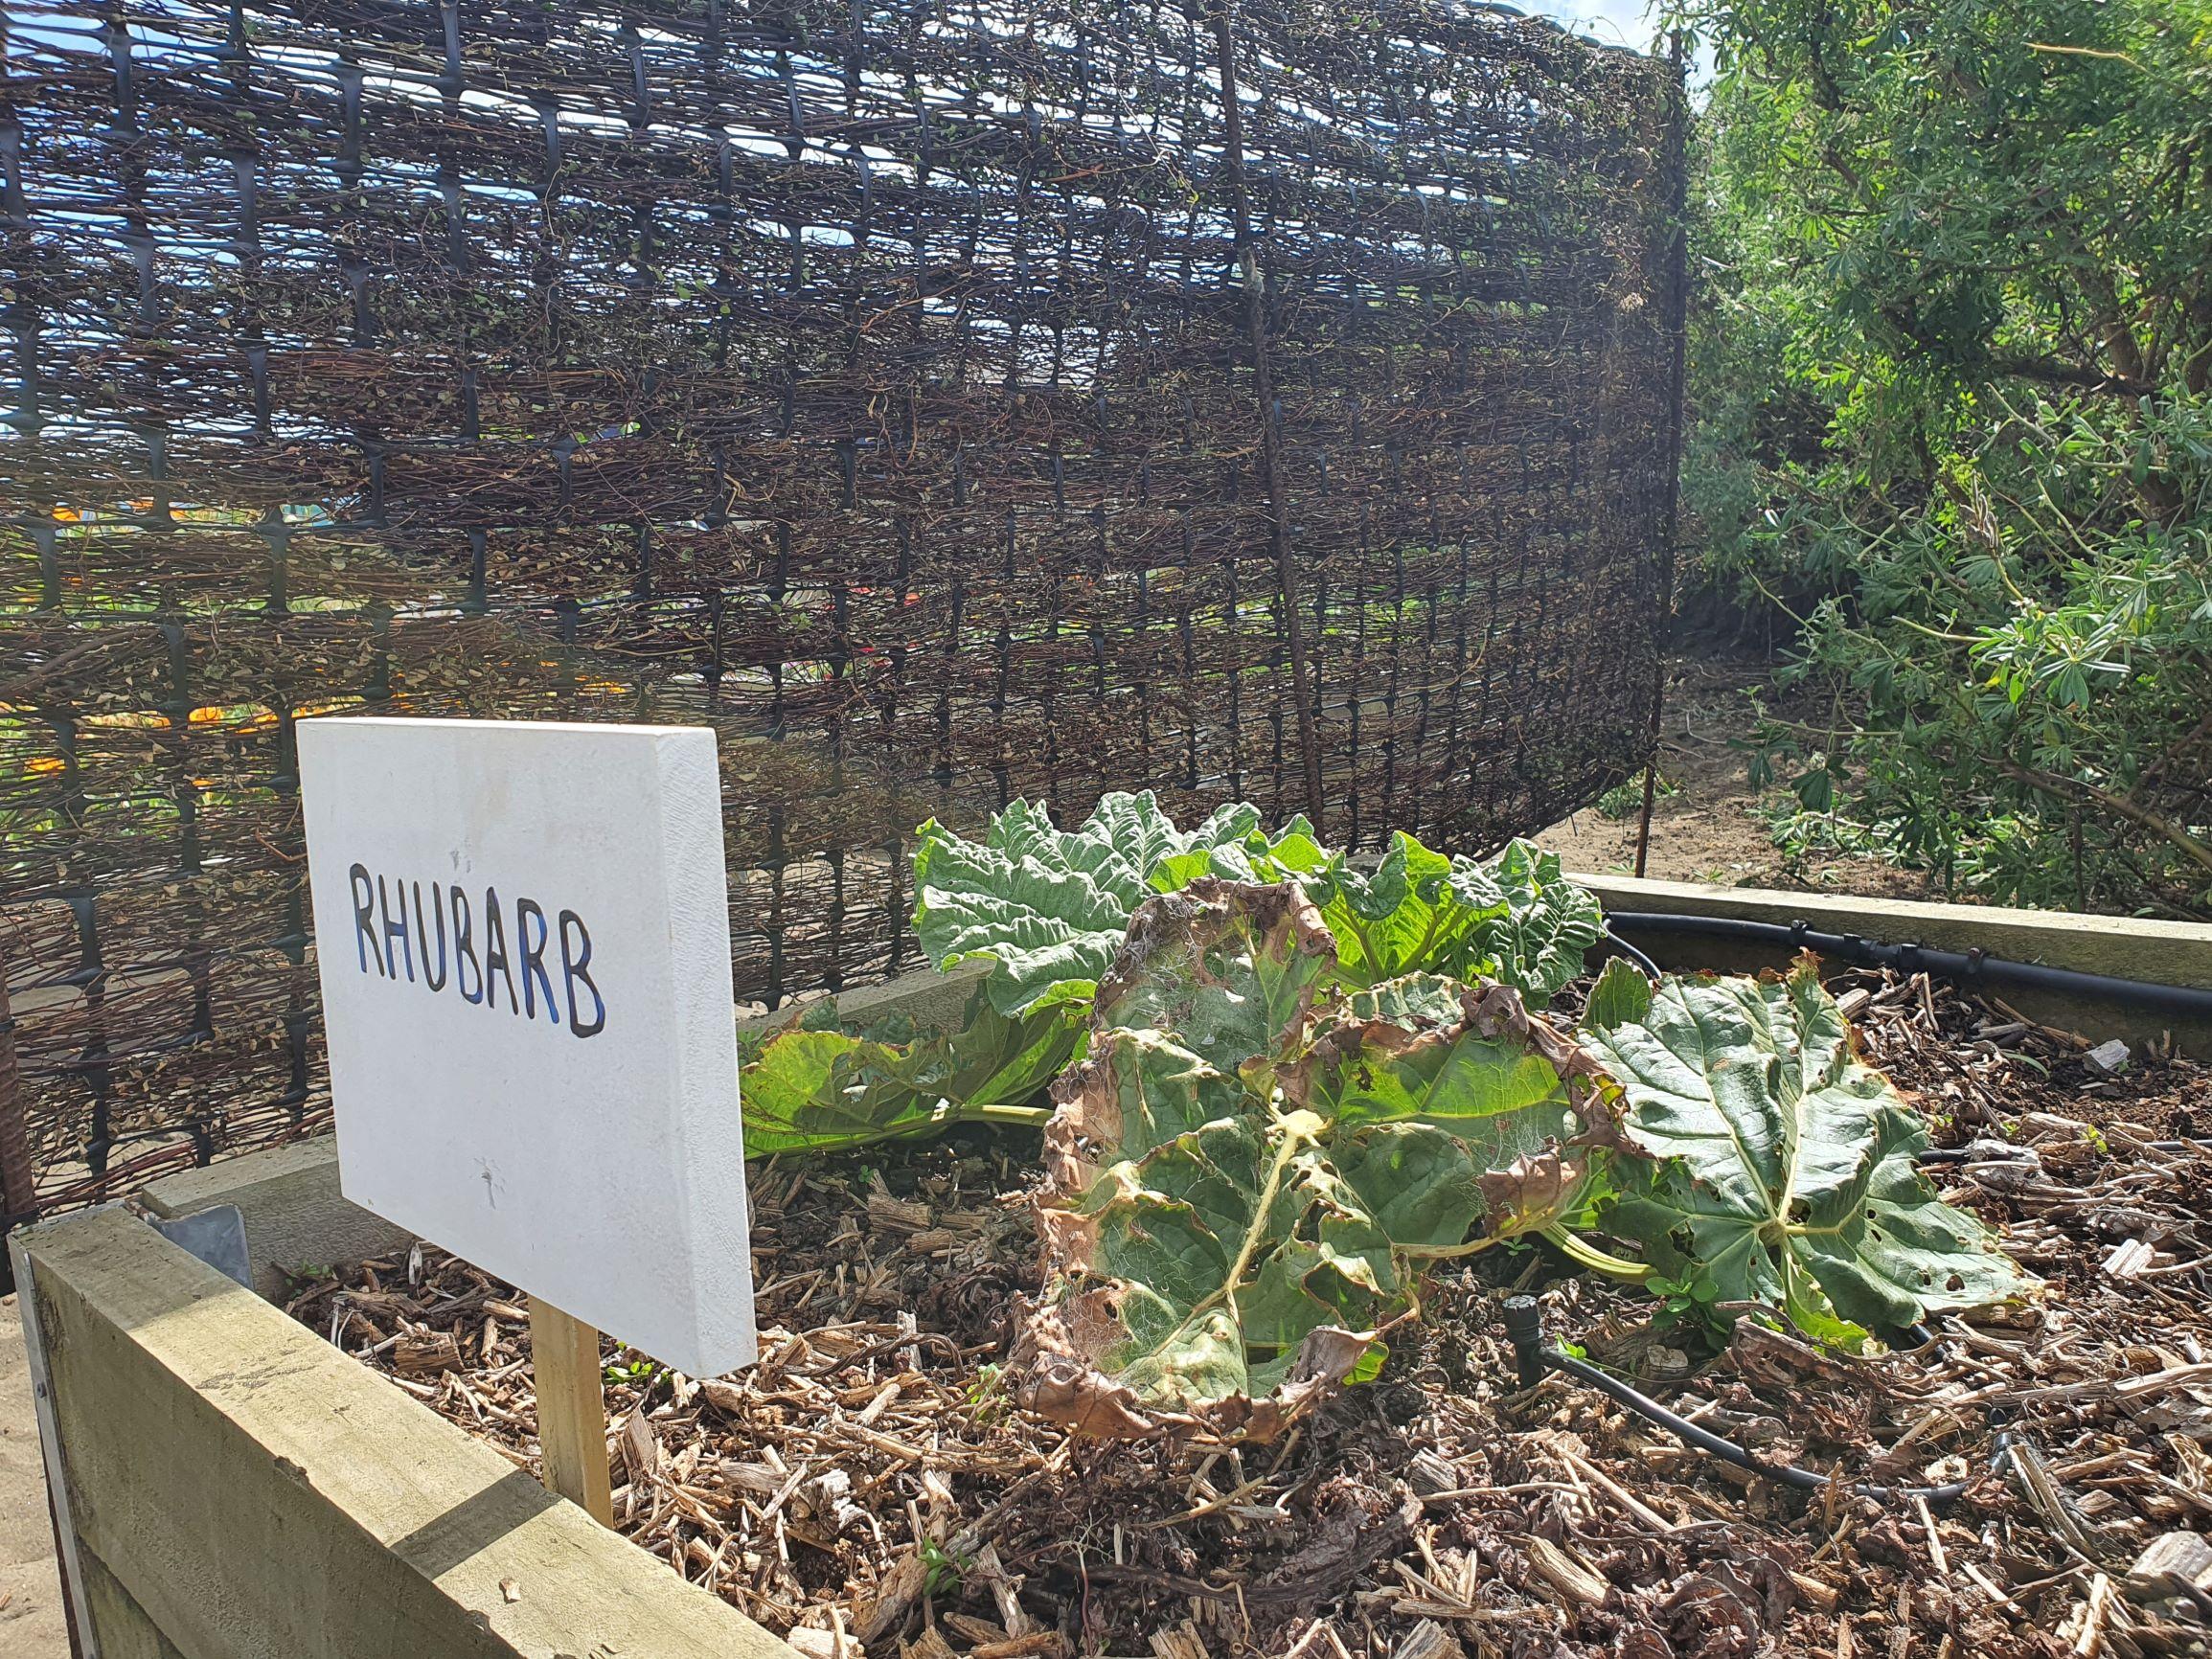 Wind protected rhubarb